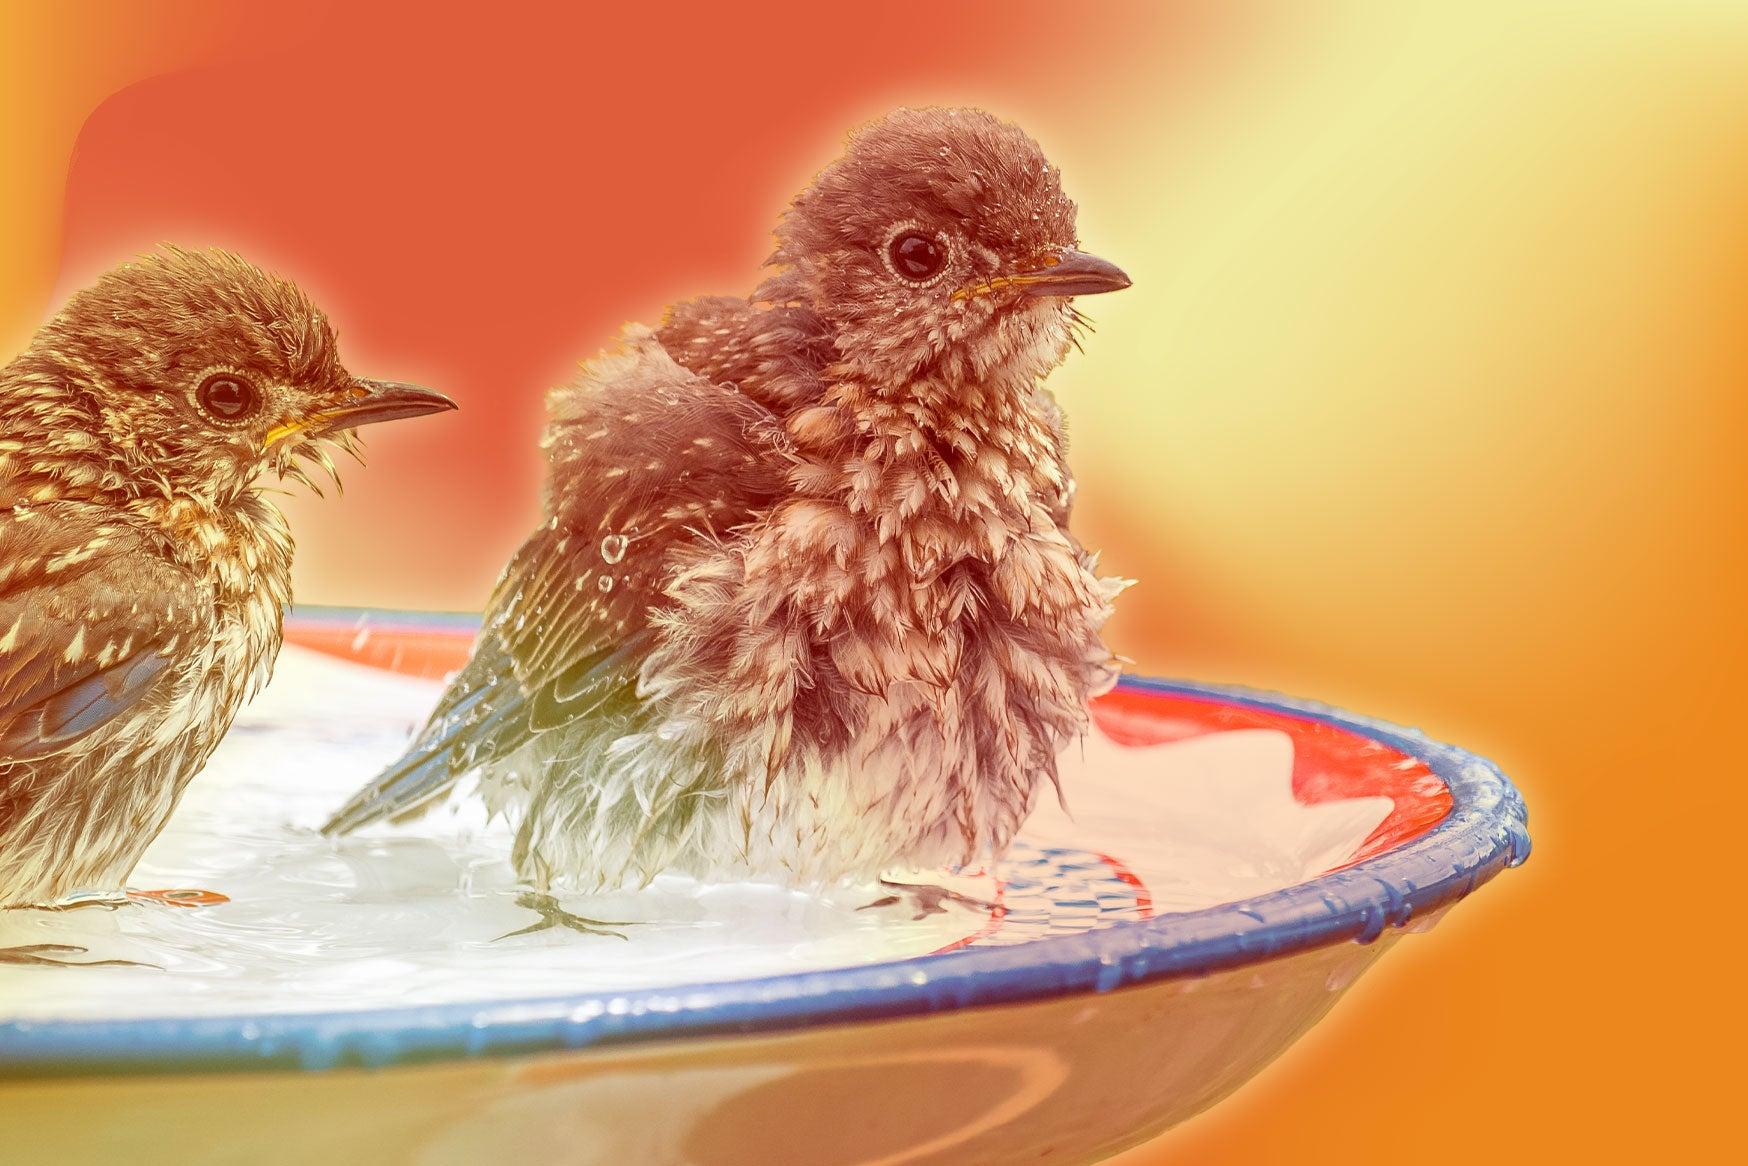 Two round birds in a birdbath.